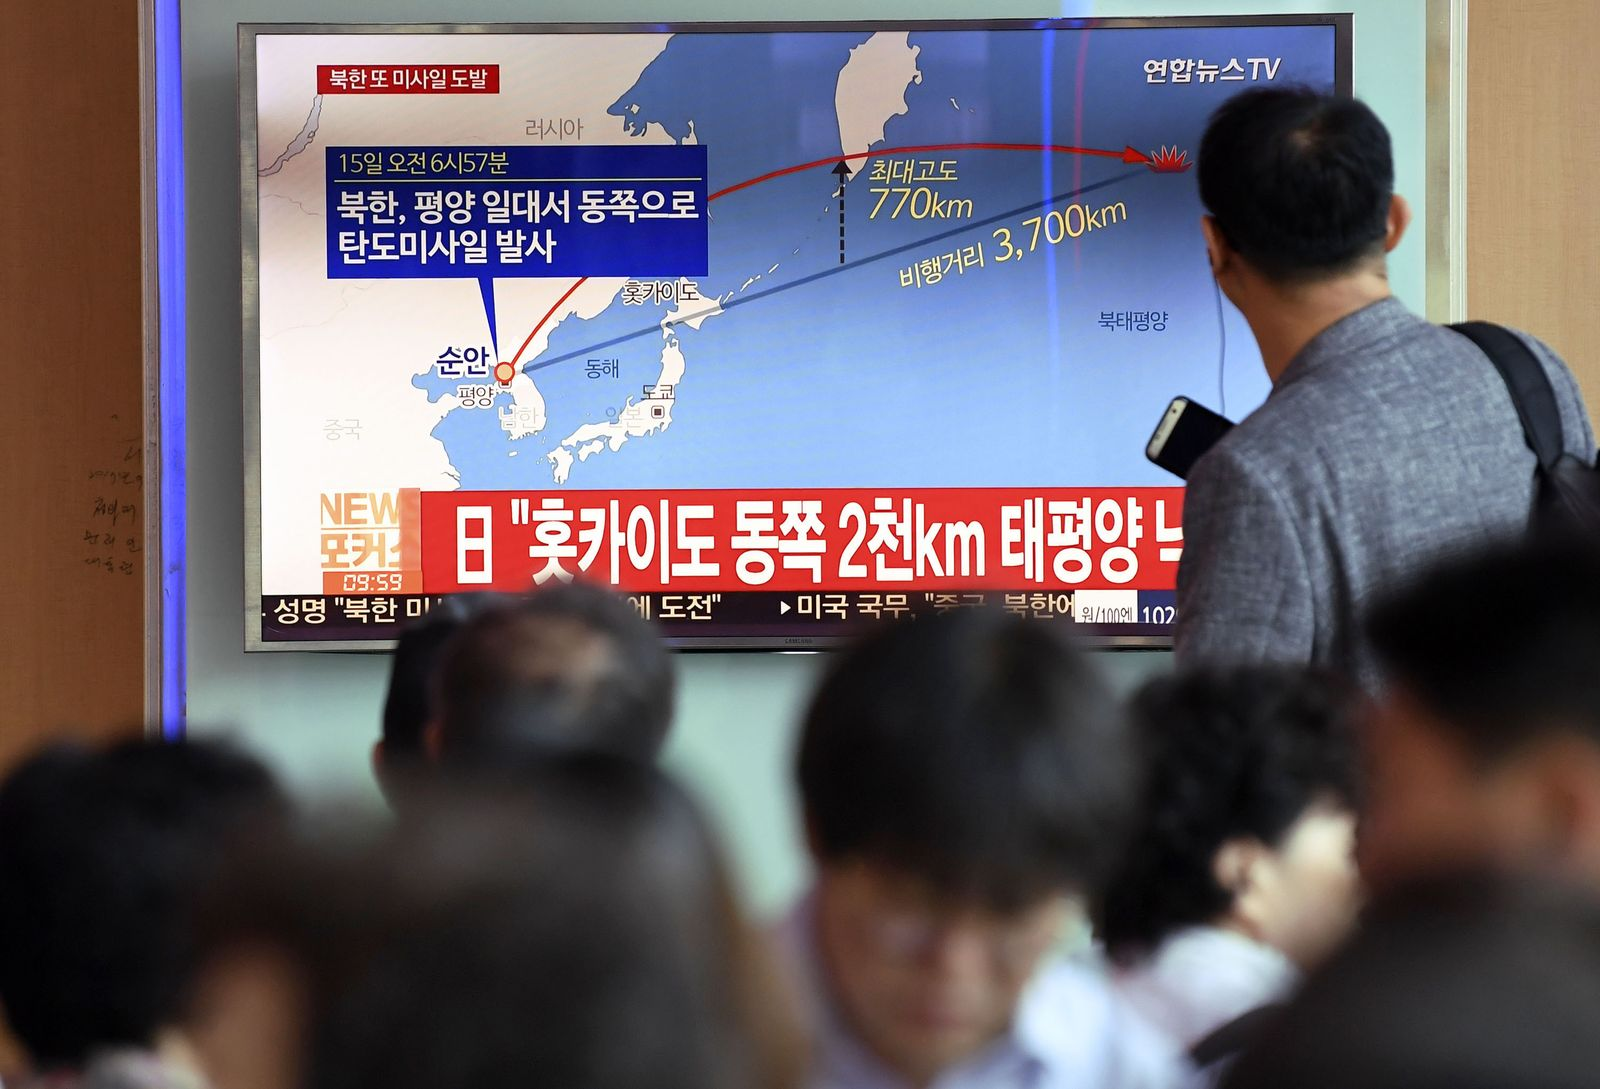 Nordkorea feuert erneut Rakete über Japan hinweg